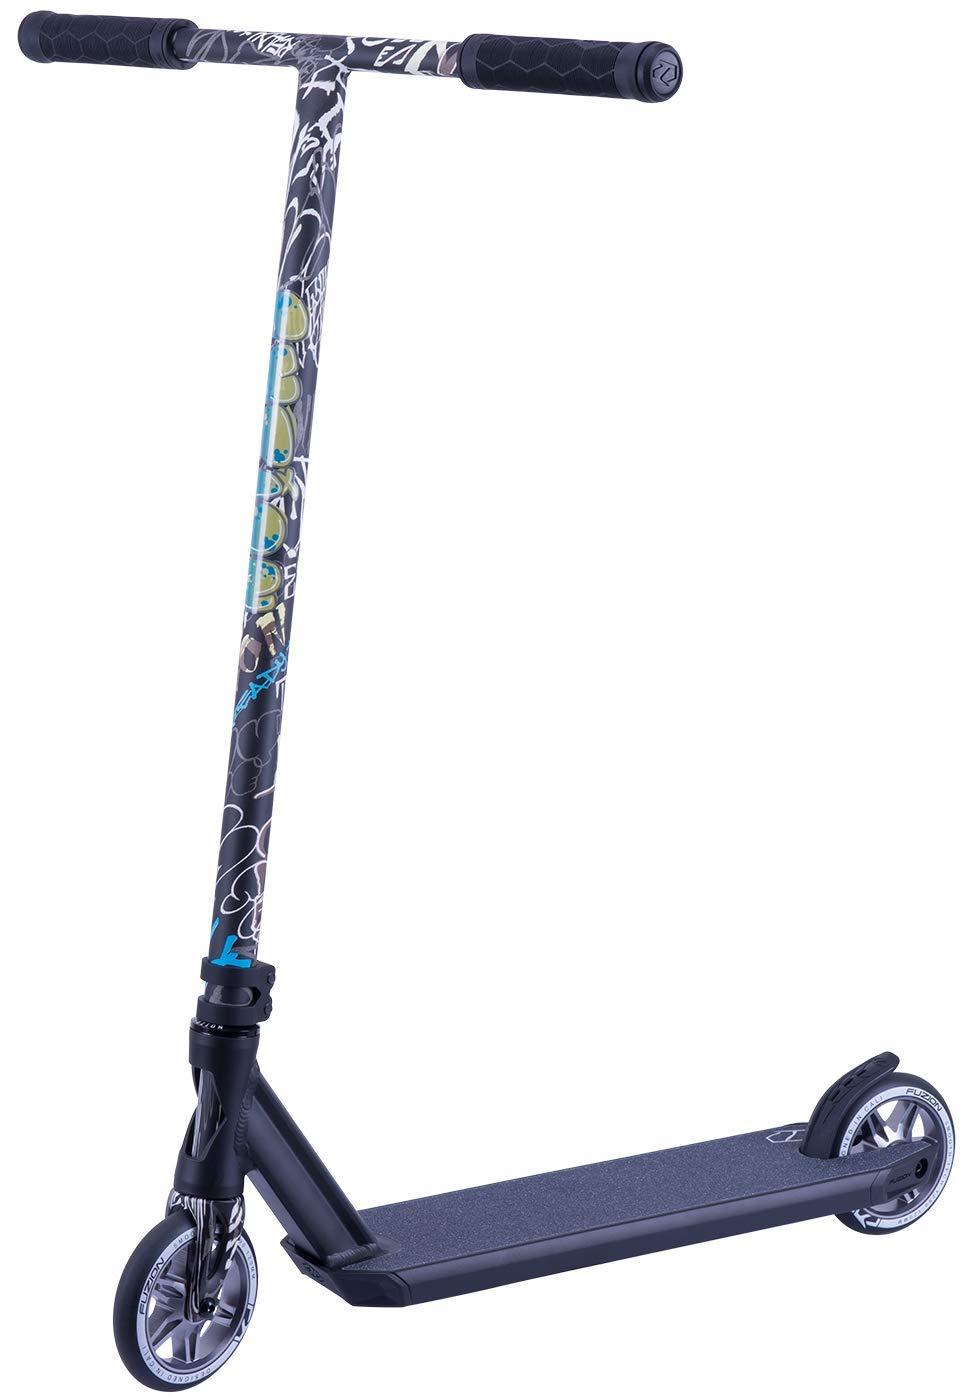 Fuzion Z350 Pro Scooter (2019 Tag)